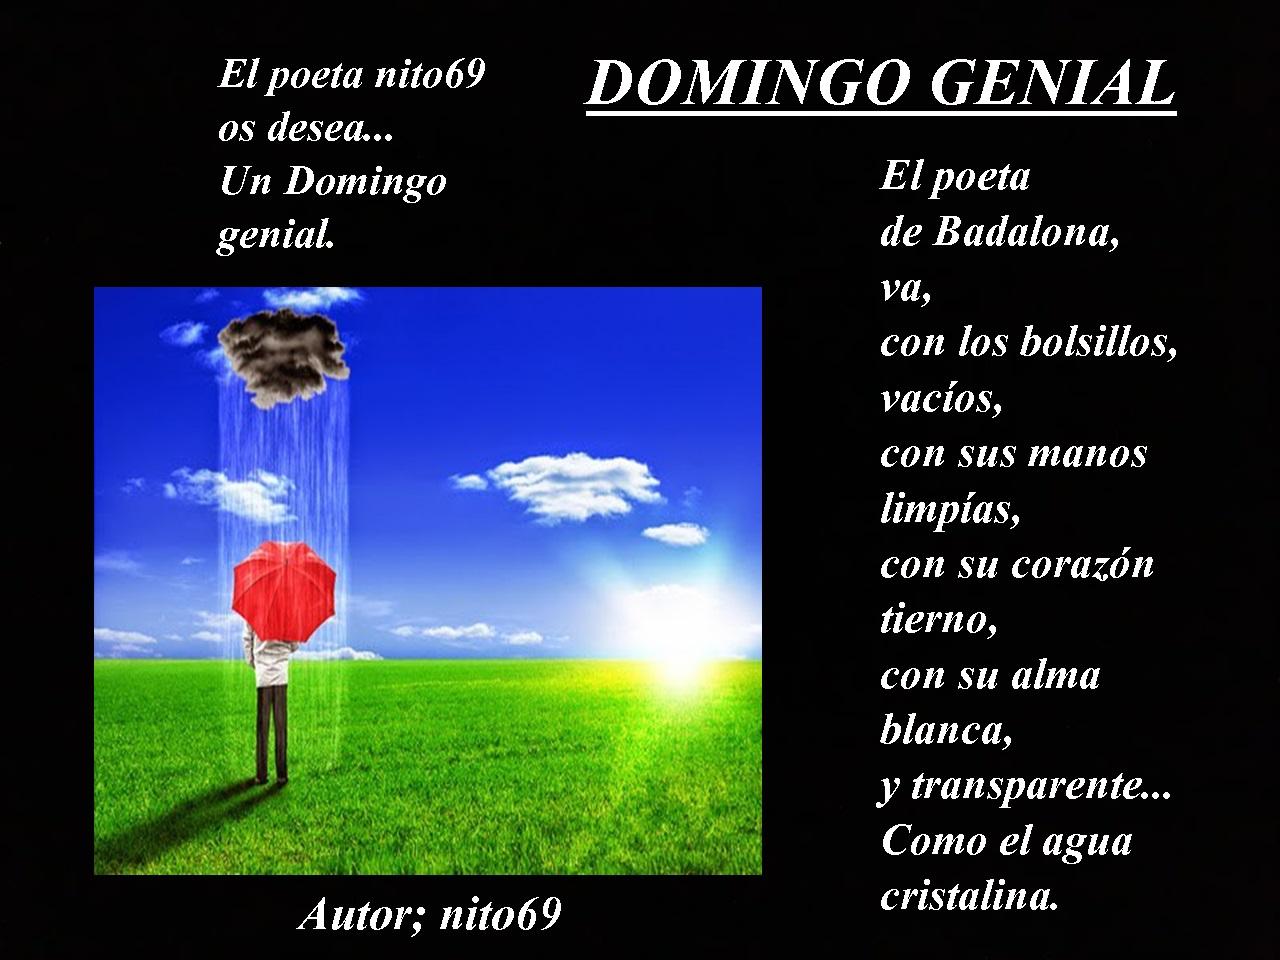 DOMINGO GENIAL